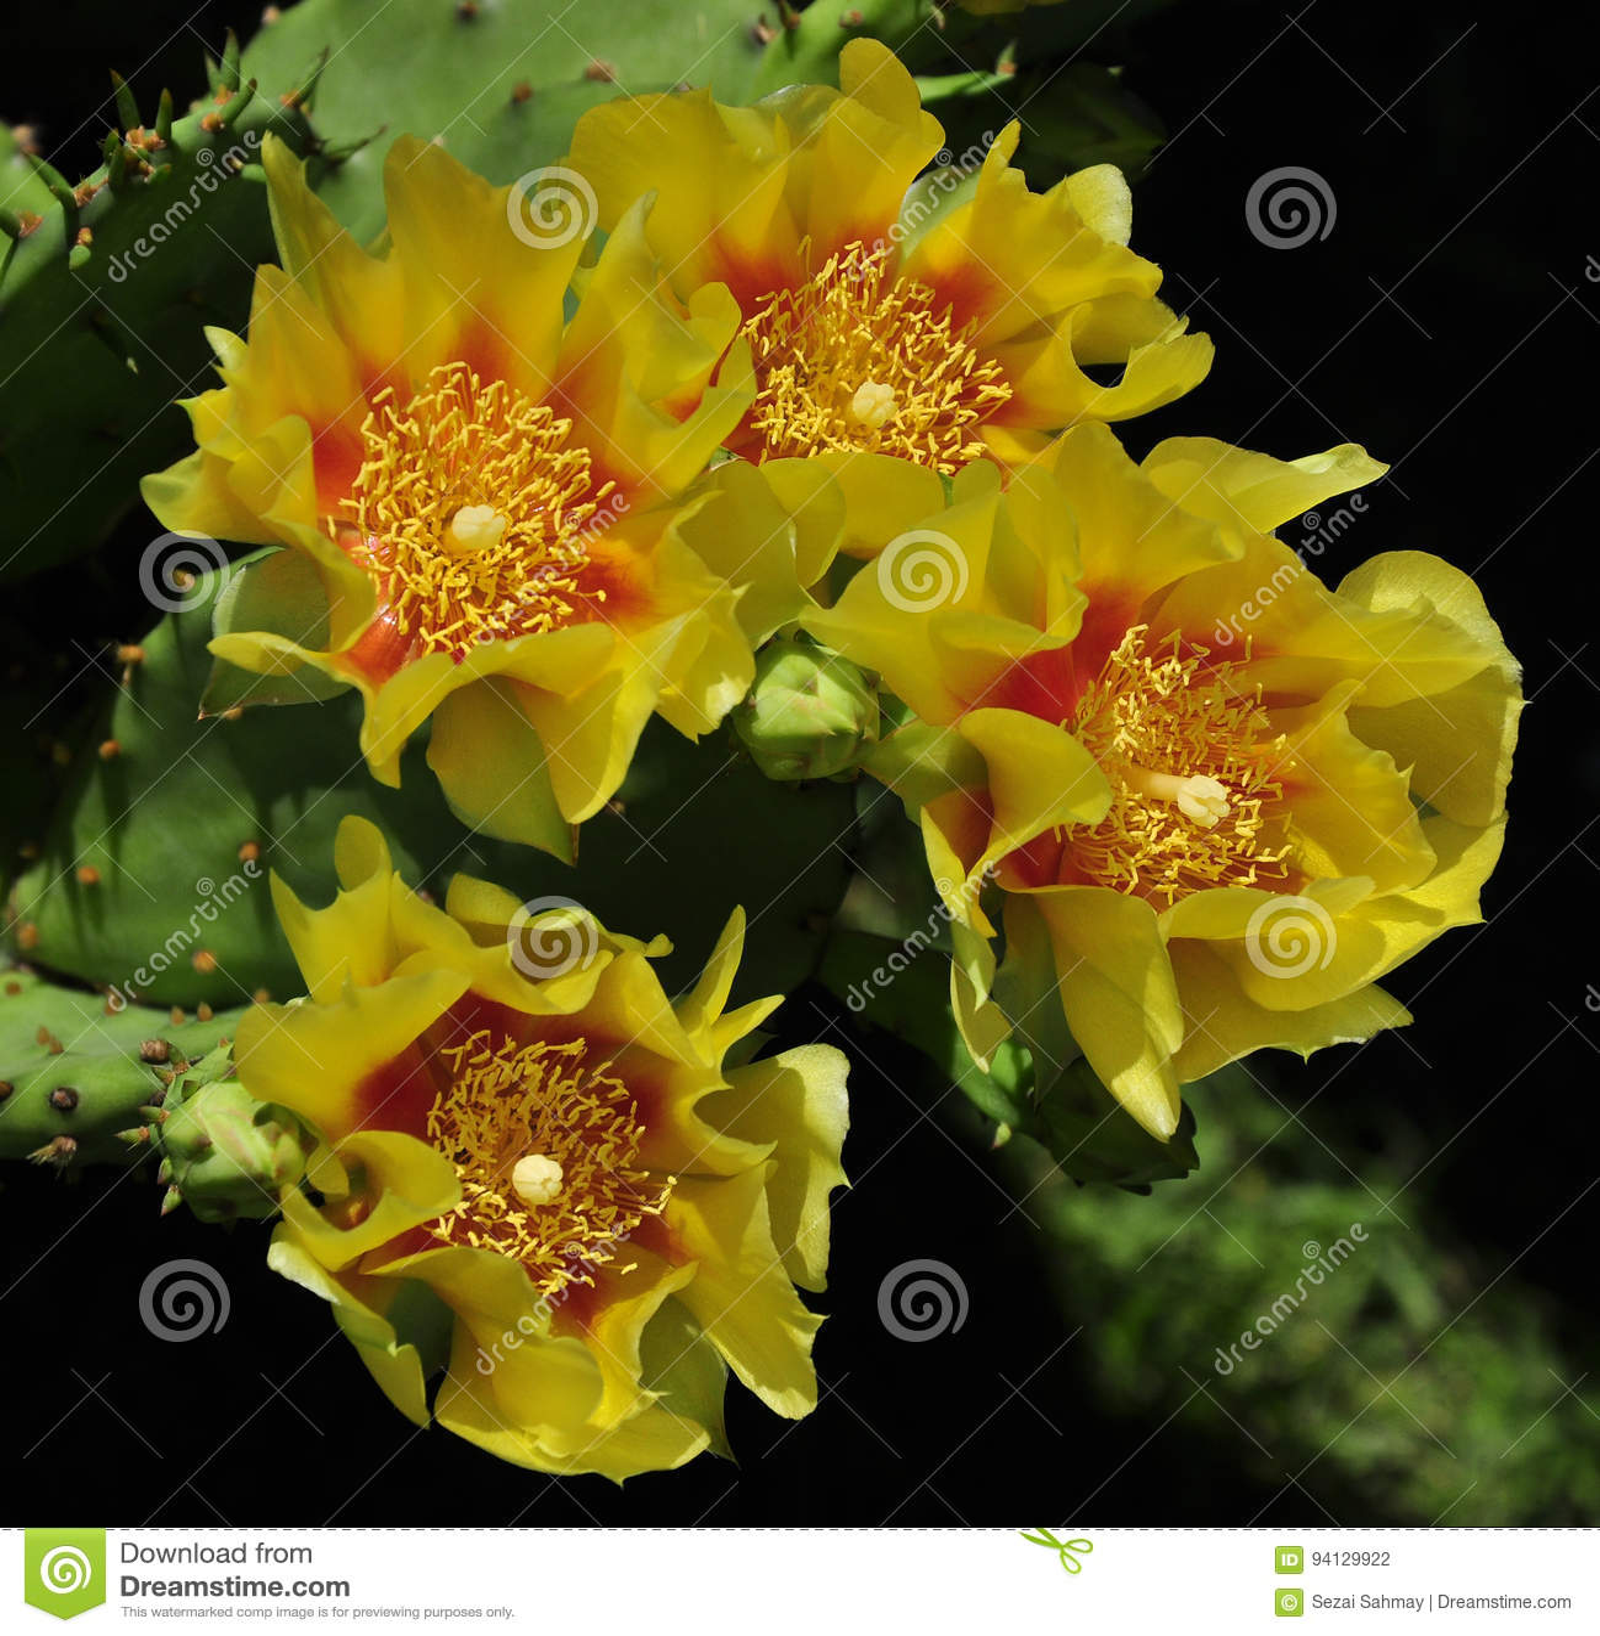 Yellow cactus flower stock photo. Image of desert, inferior - 94129922